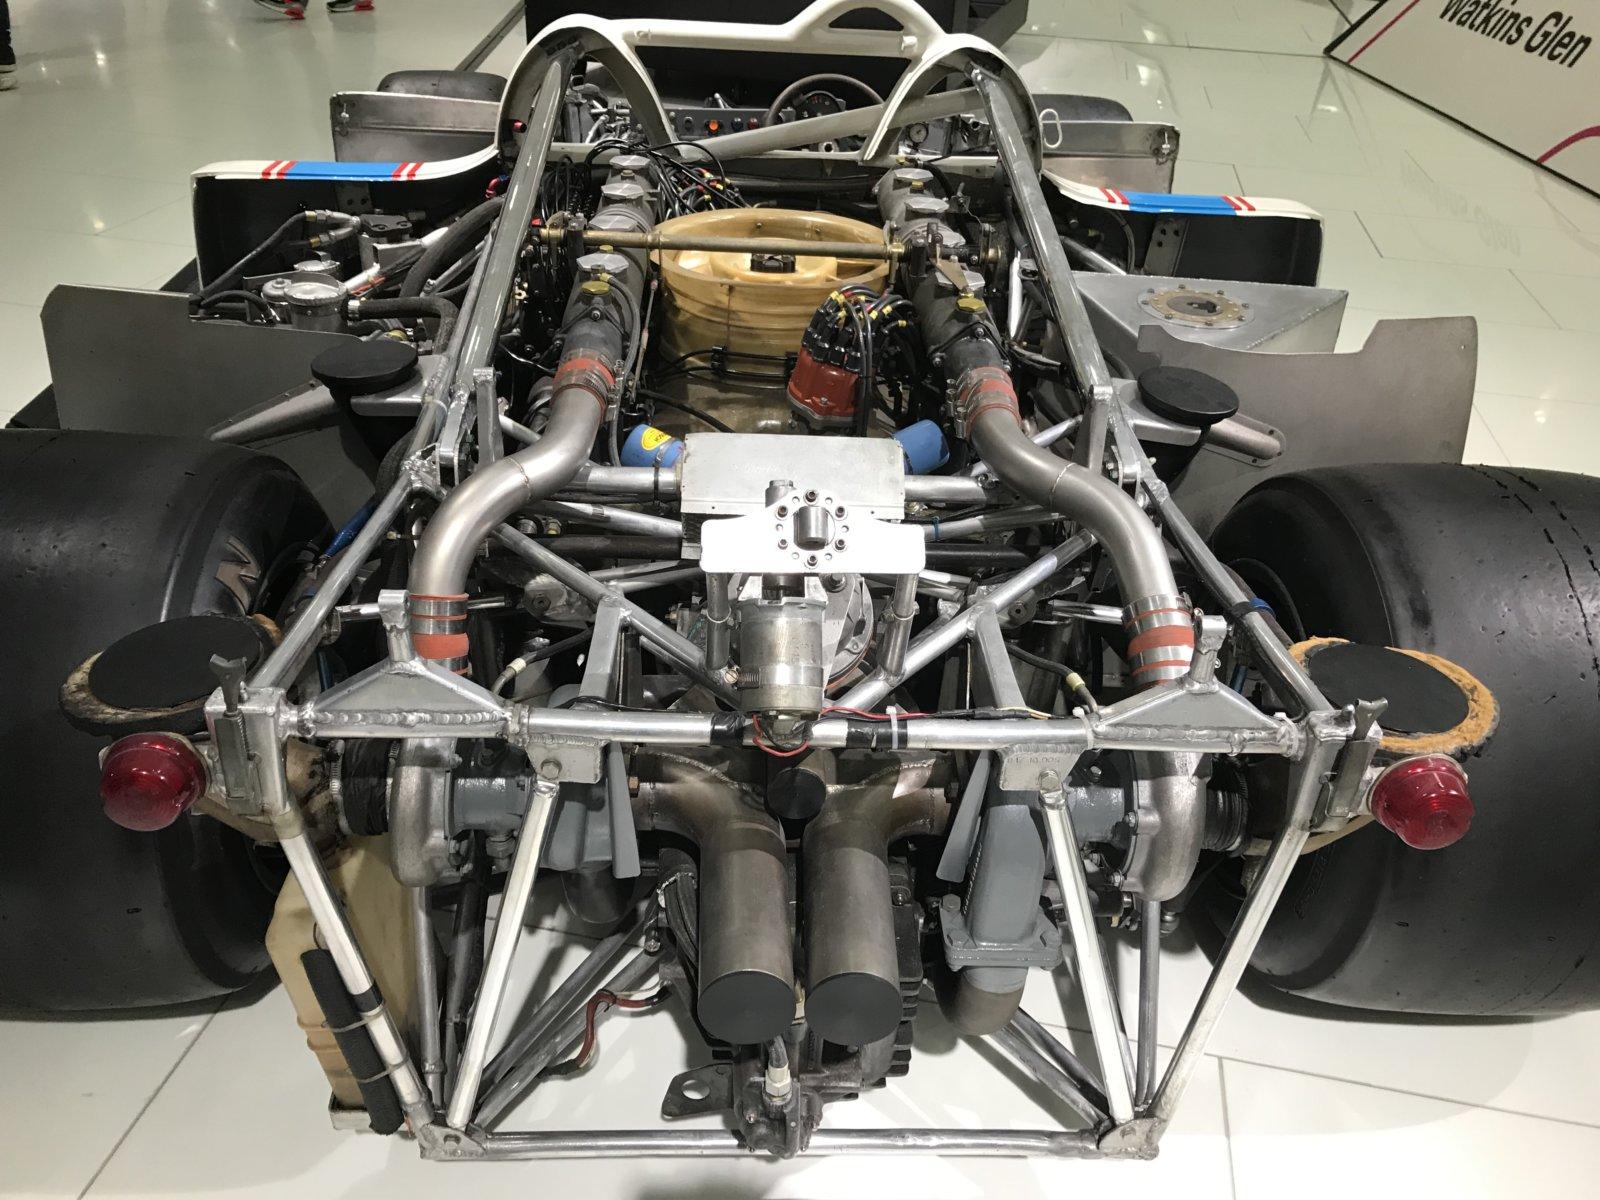 07-28 Porsche Race Car 21